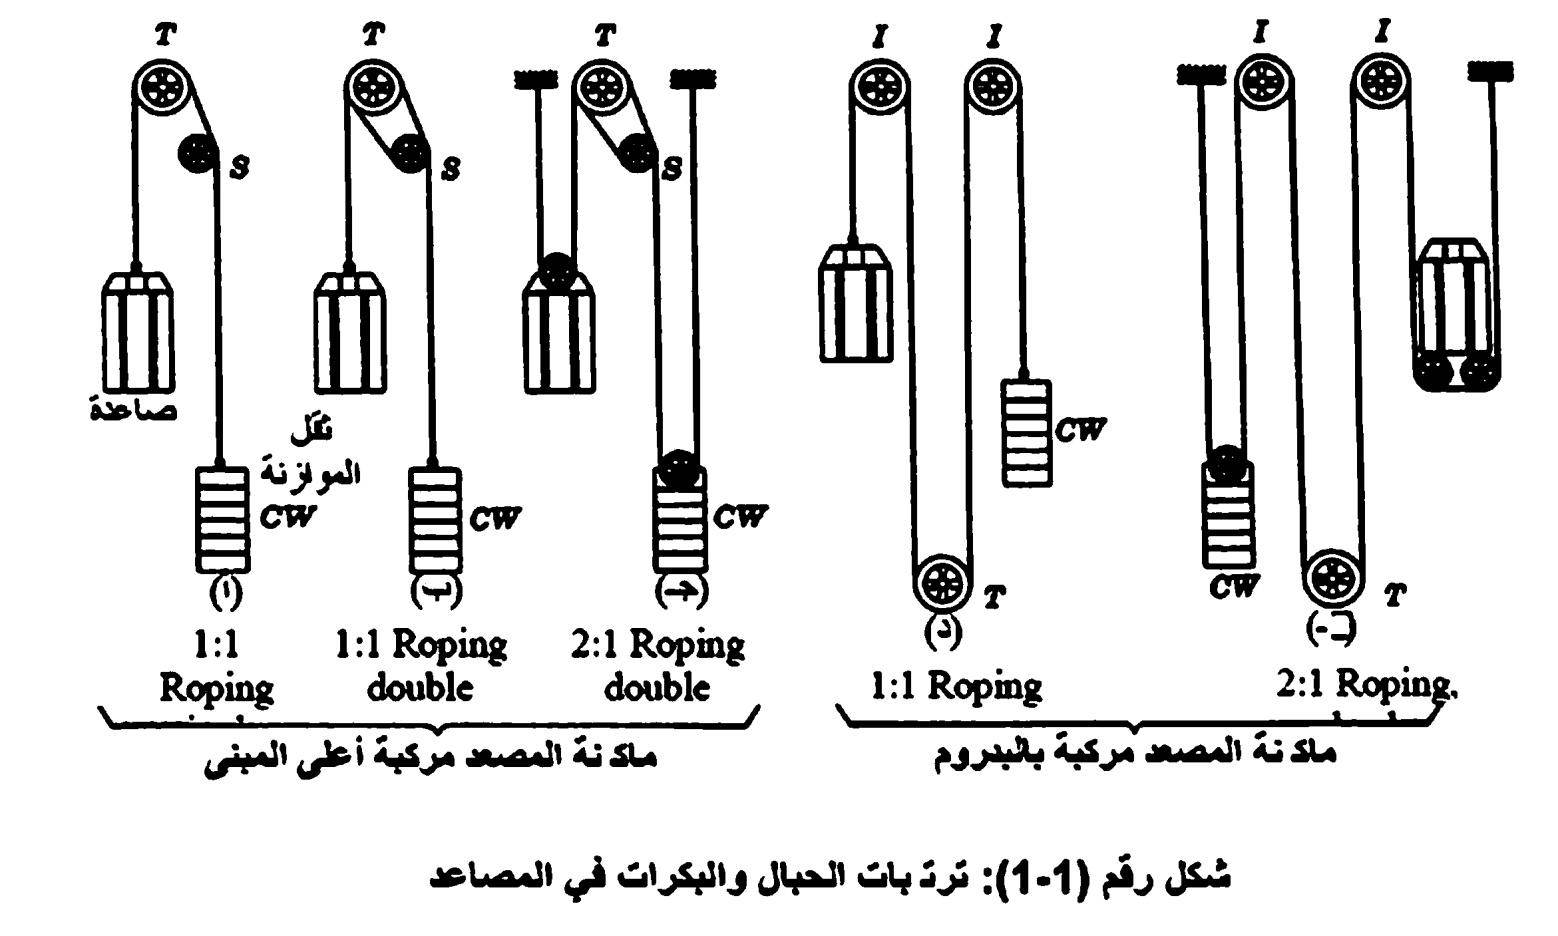 u062a u062d u0645 u064a u0644  u0643 u062a u0627 u0628 power system distribution